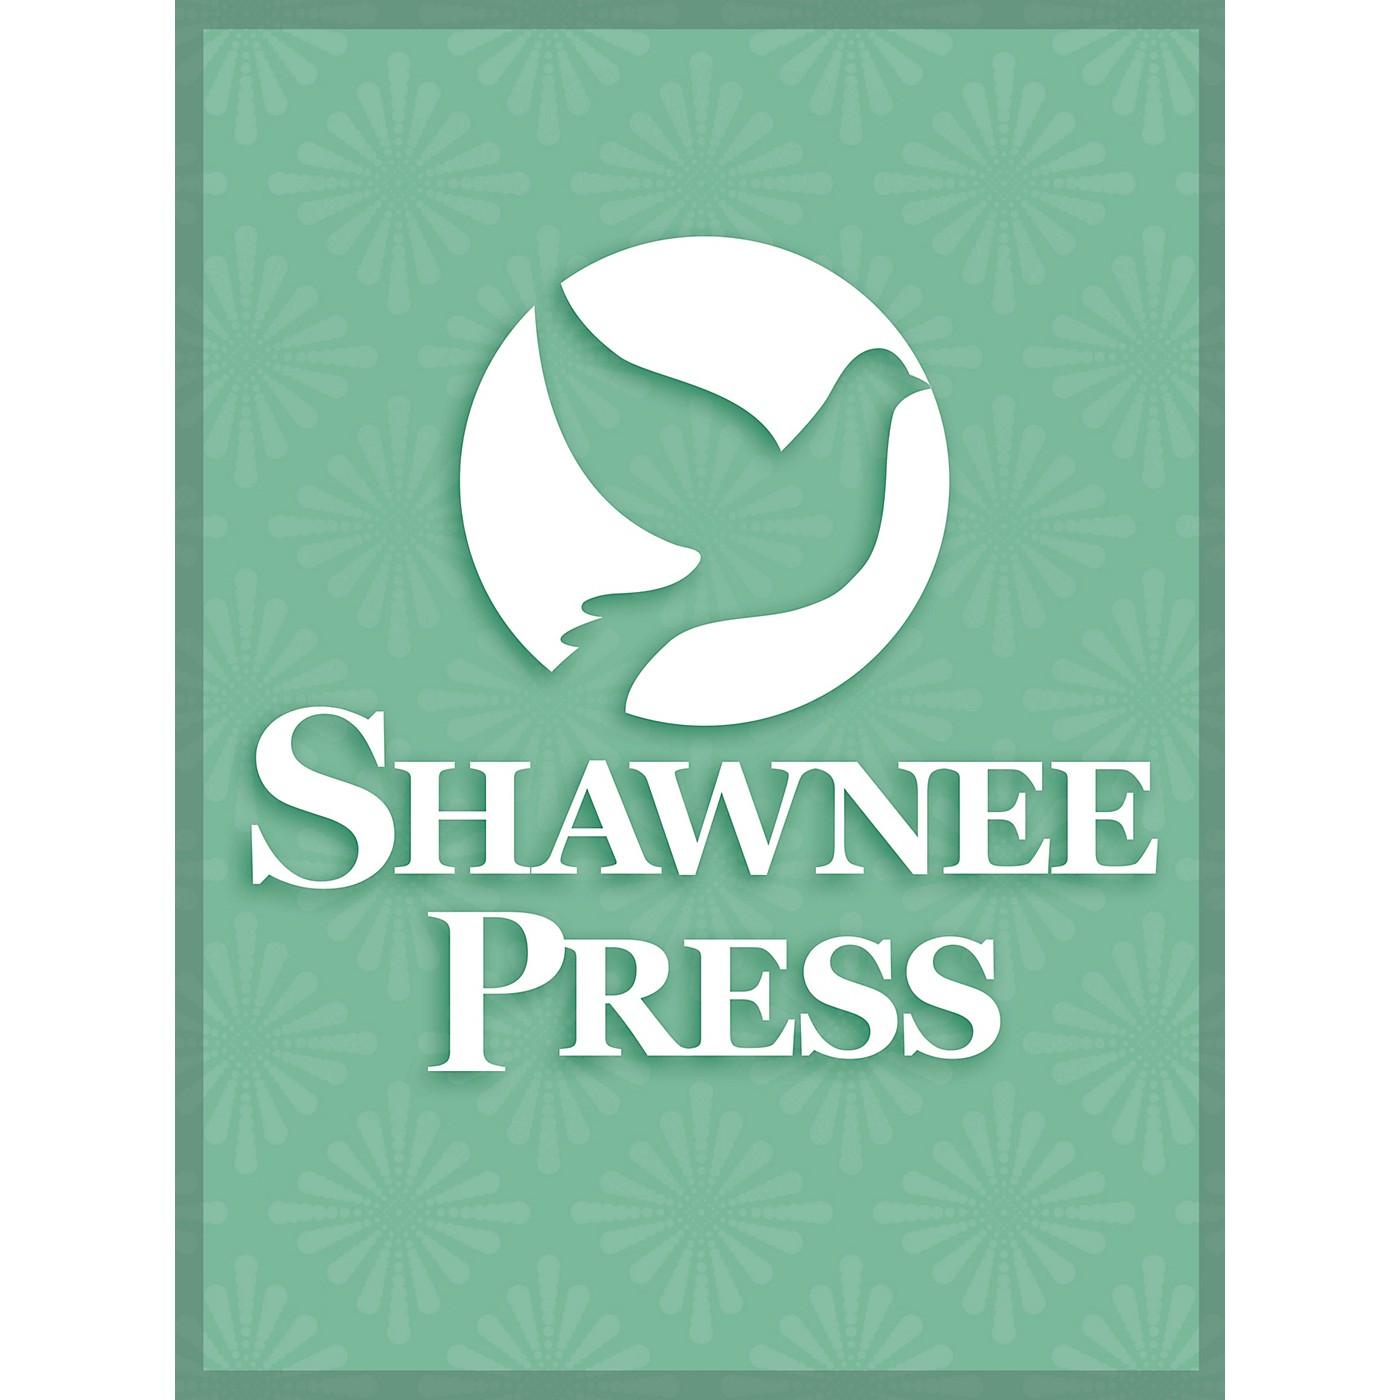 Shawnee Press N'kosi Sikelell Afrika (God Bless Africa) (Turtle Creek Series) TTBB Arranged by Gabriel Larentz-Jones thumbnail